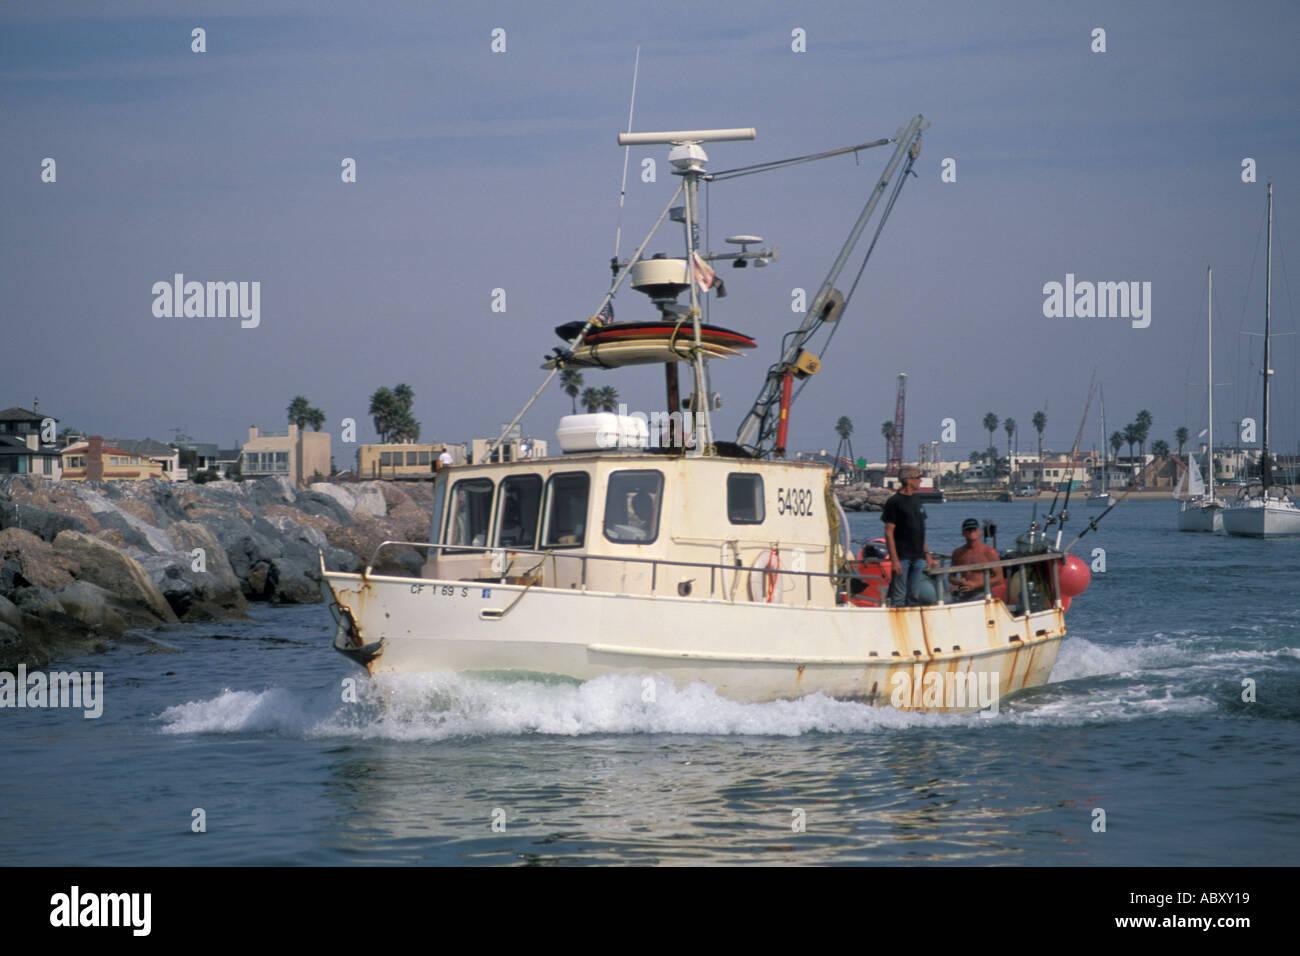 Commercial fishing boats enter santa barbara channel from for Santa barbara fishing